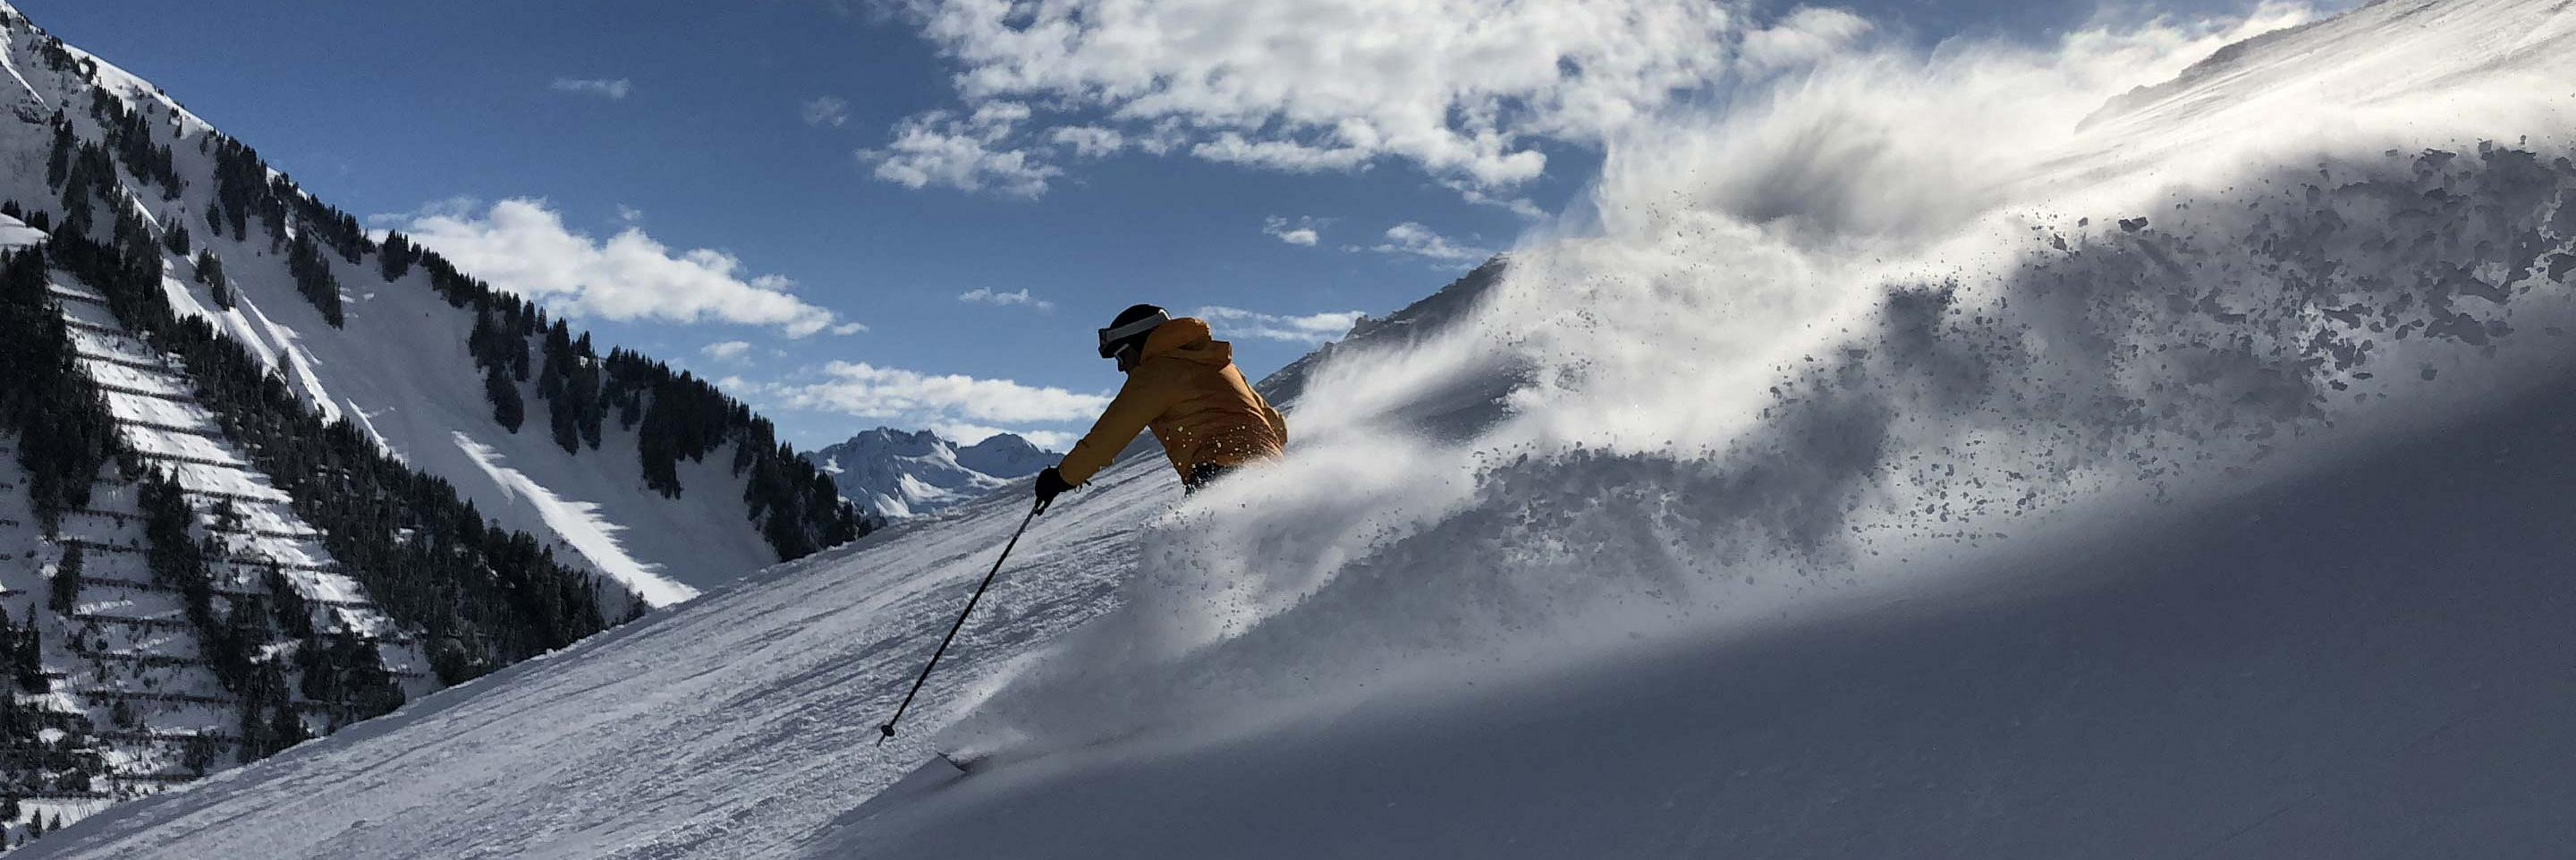 Wintersport im Rotwandblick